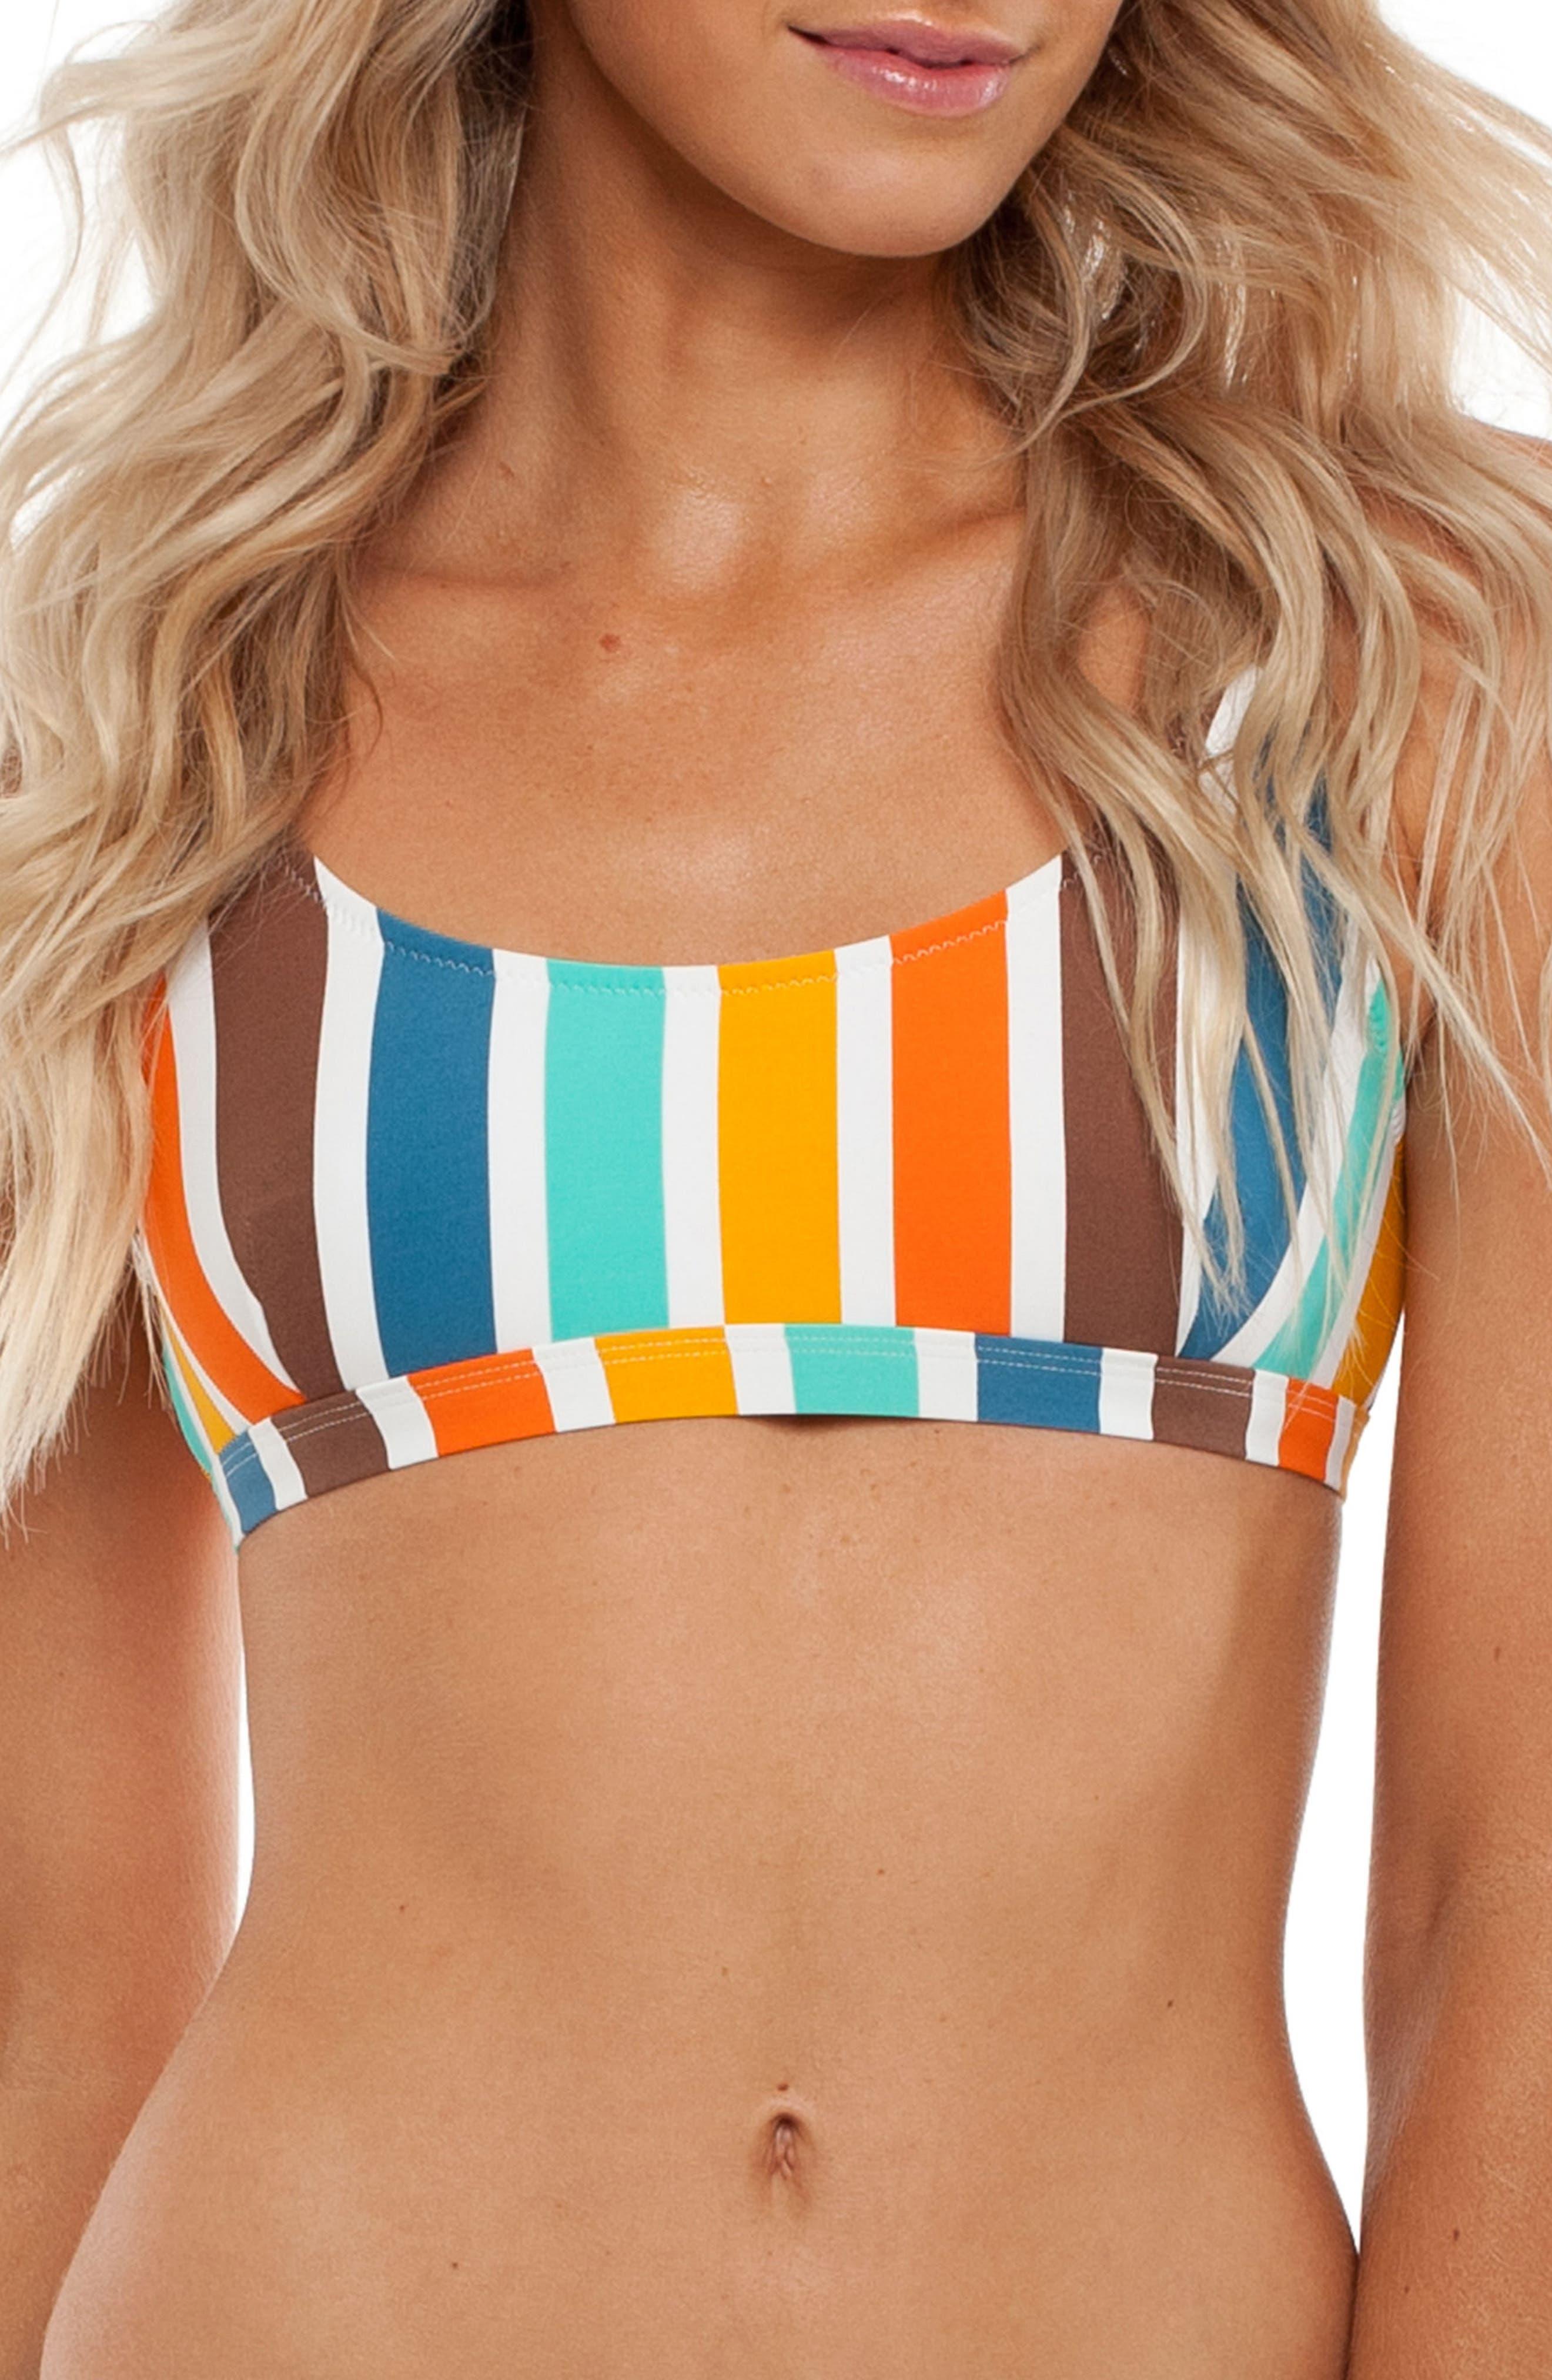 Zimbabwe Scoop Bikini Top,                             Main thumbnail 1, color,                             Tangelo Multi